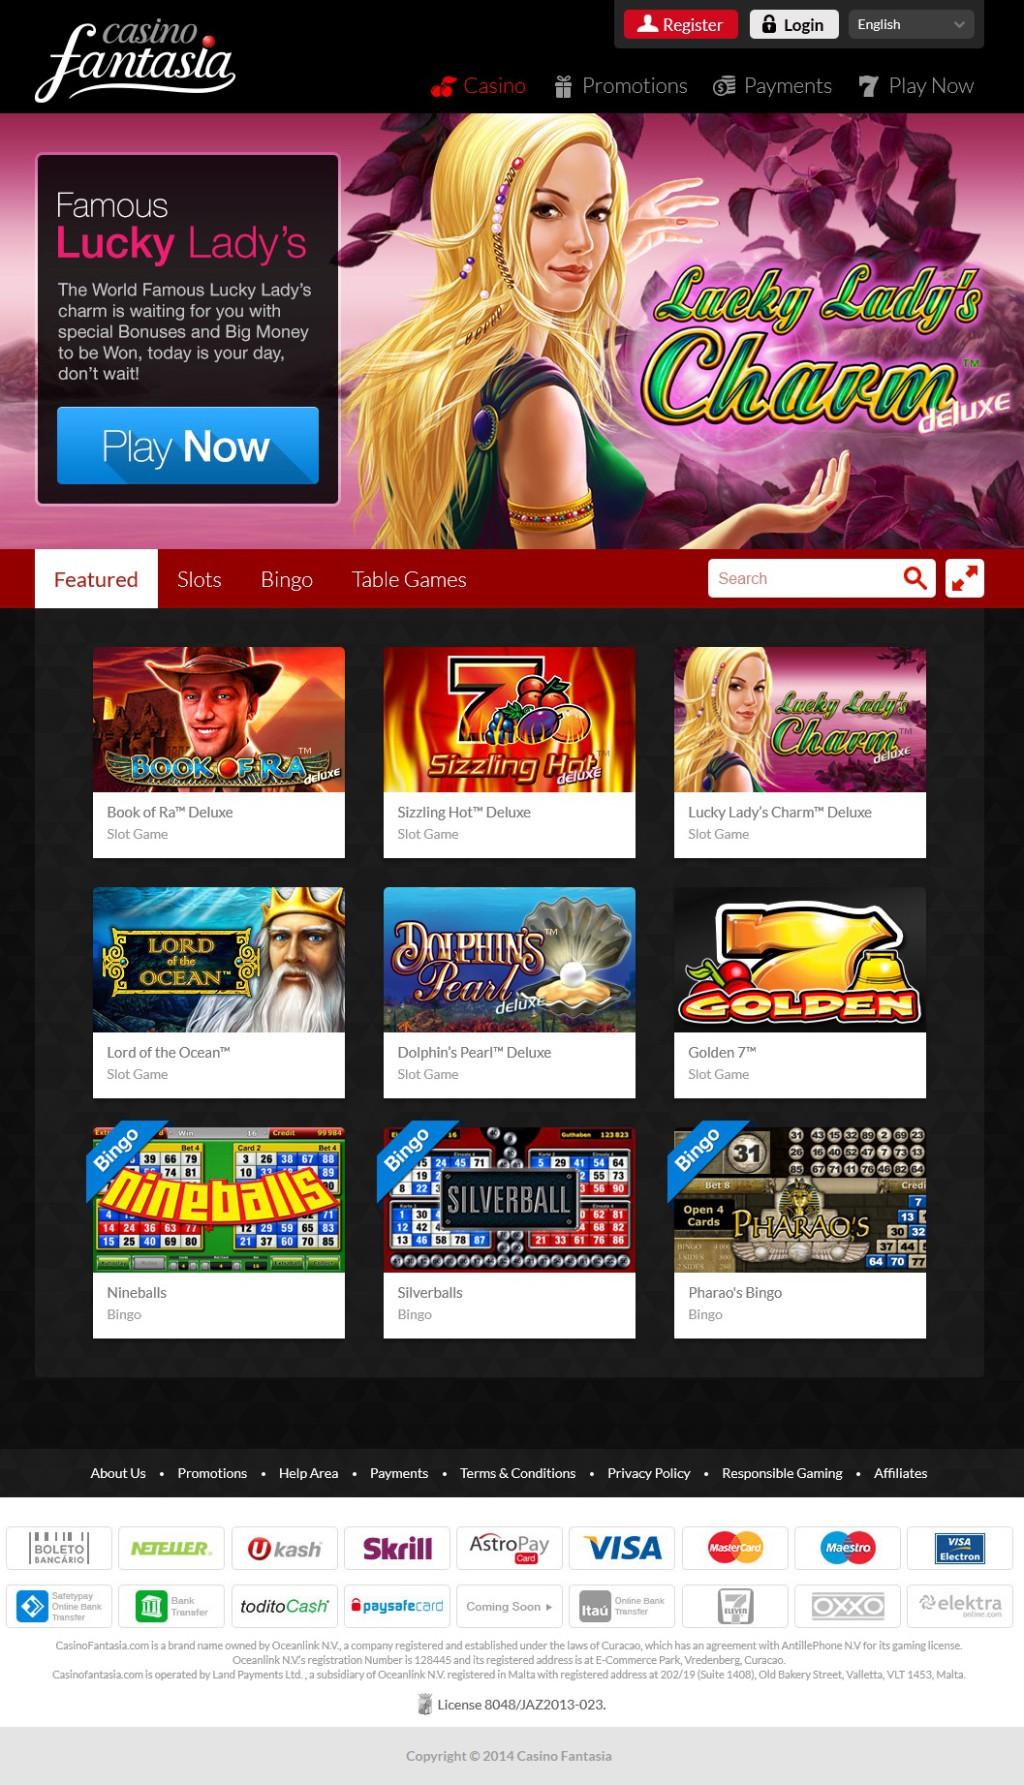 www.fantasia casino